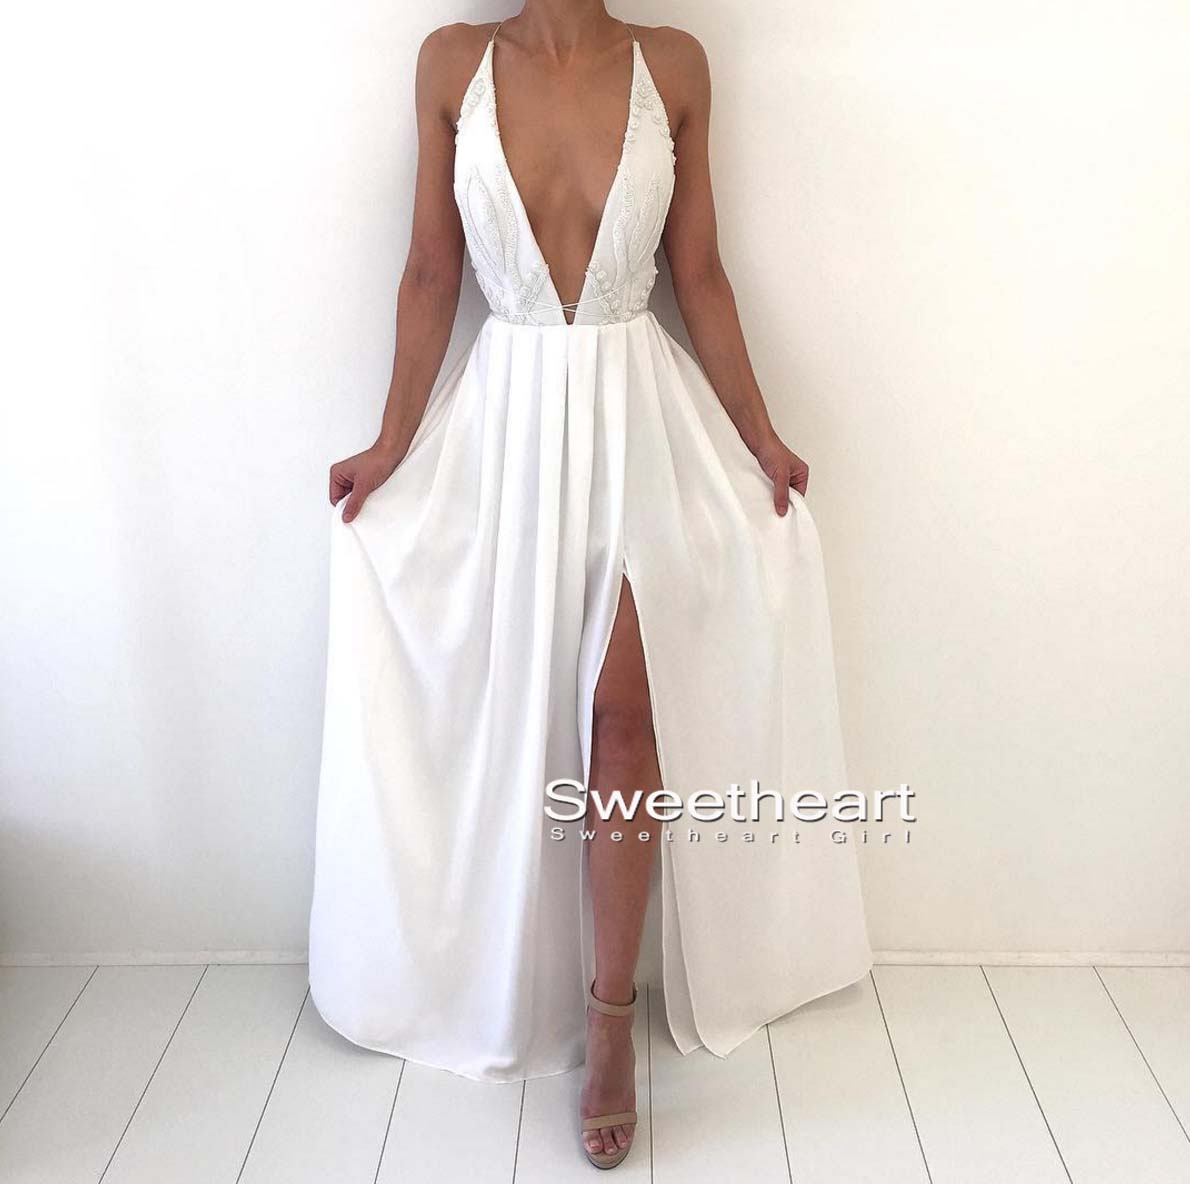 Sweetheart Girl | Simple white v neck chiffon long prom dress ...